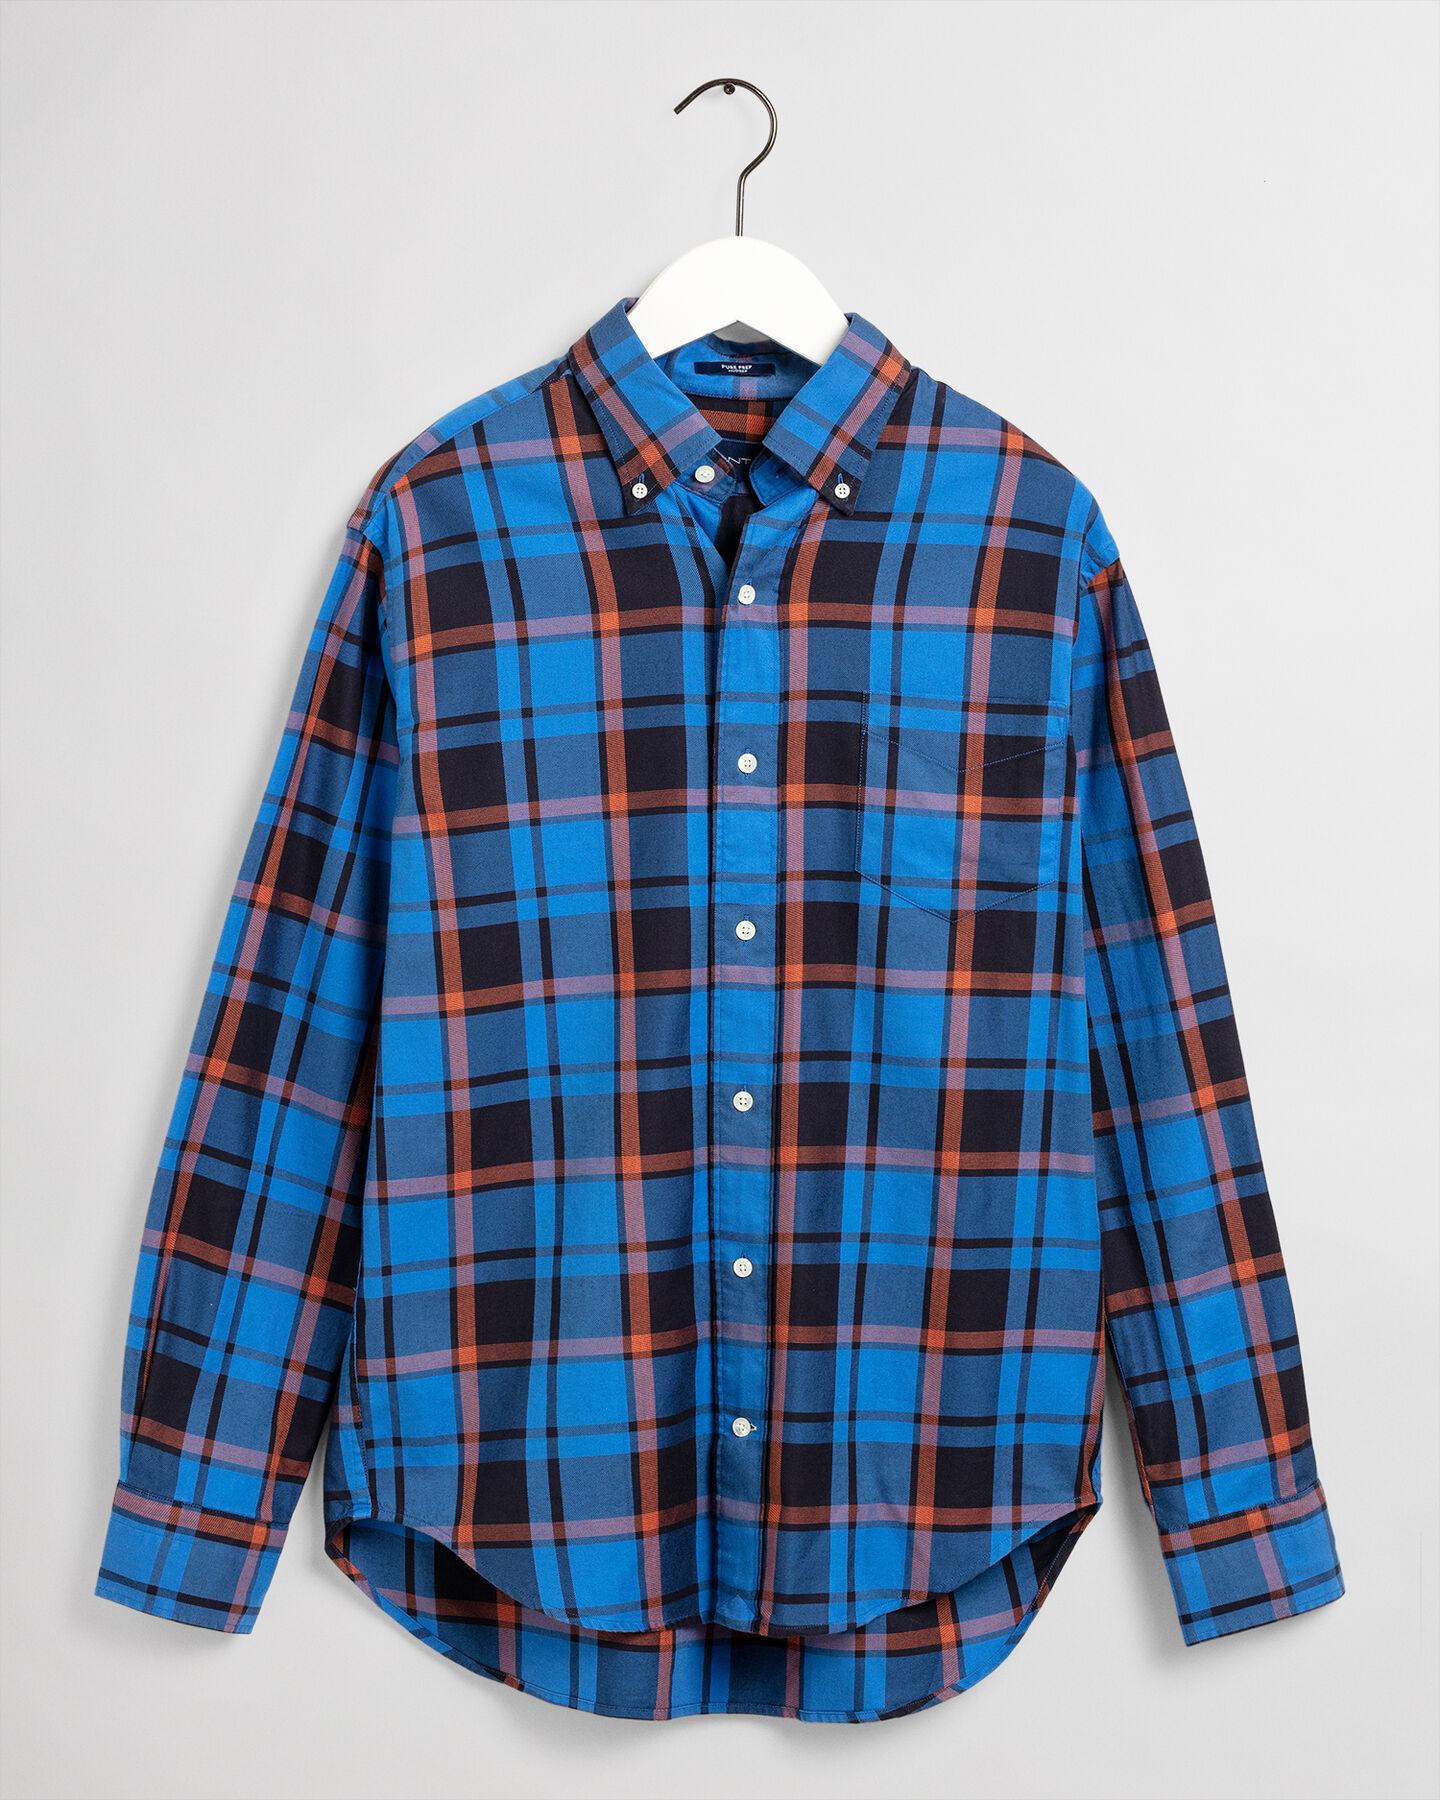 Pure Prep Hugger-Fit Twill Hemd mit Karomuster